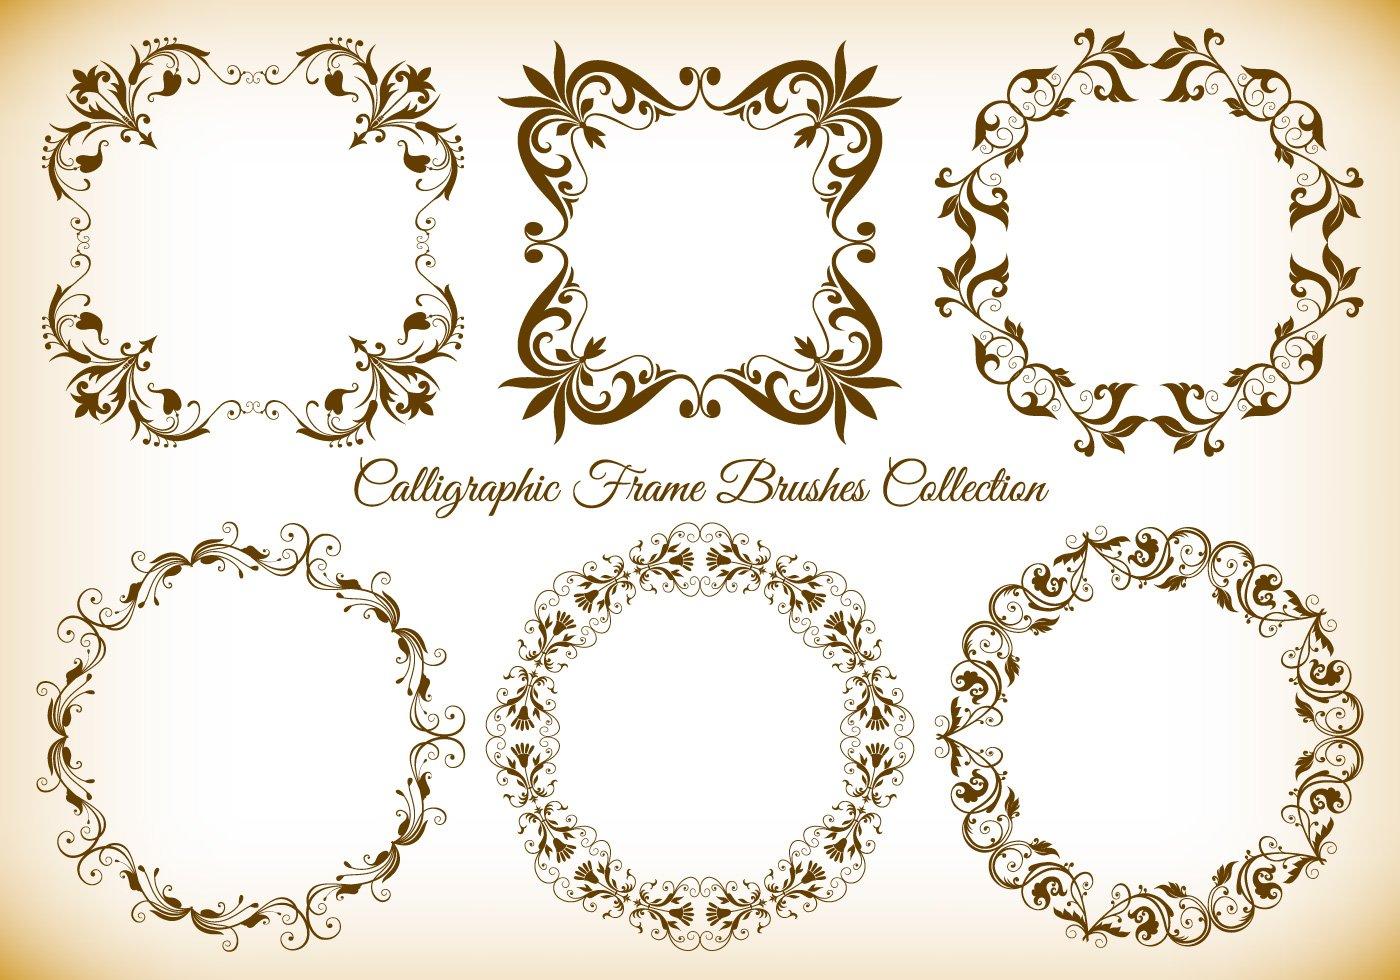 Calligraphic frame brushes free photoshop at